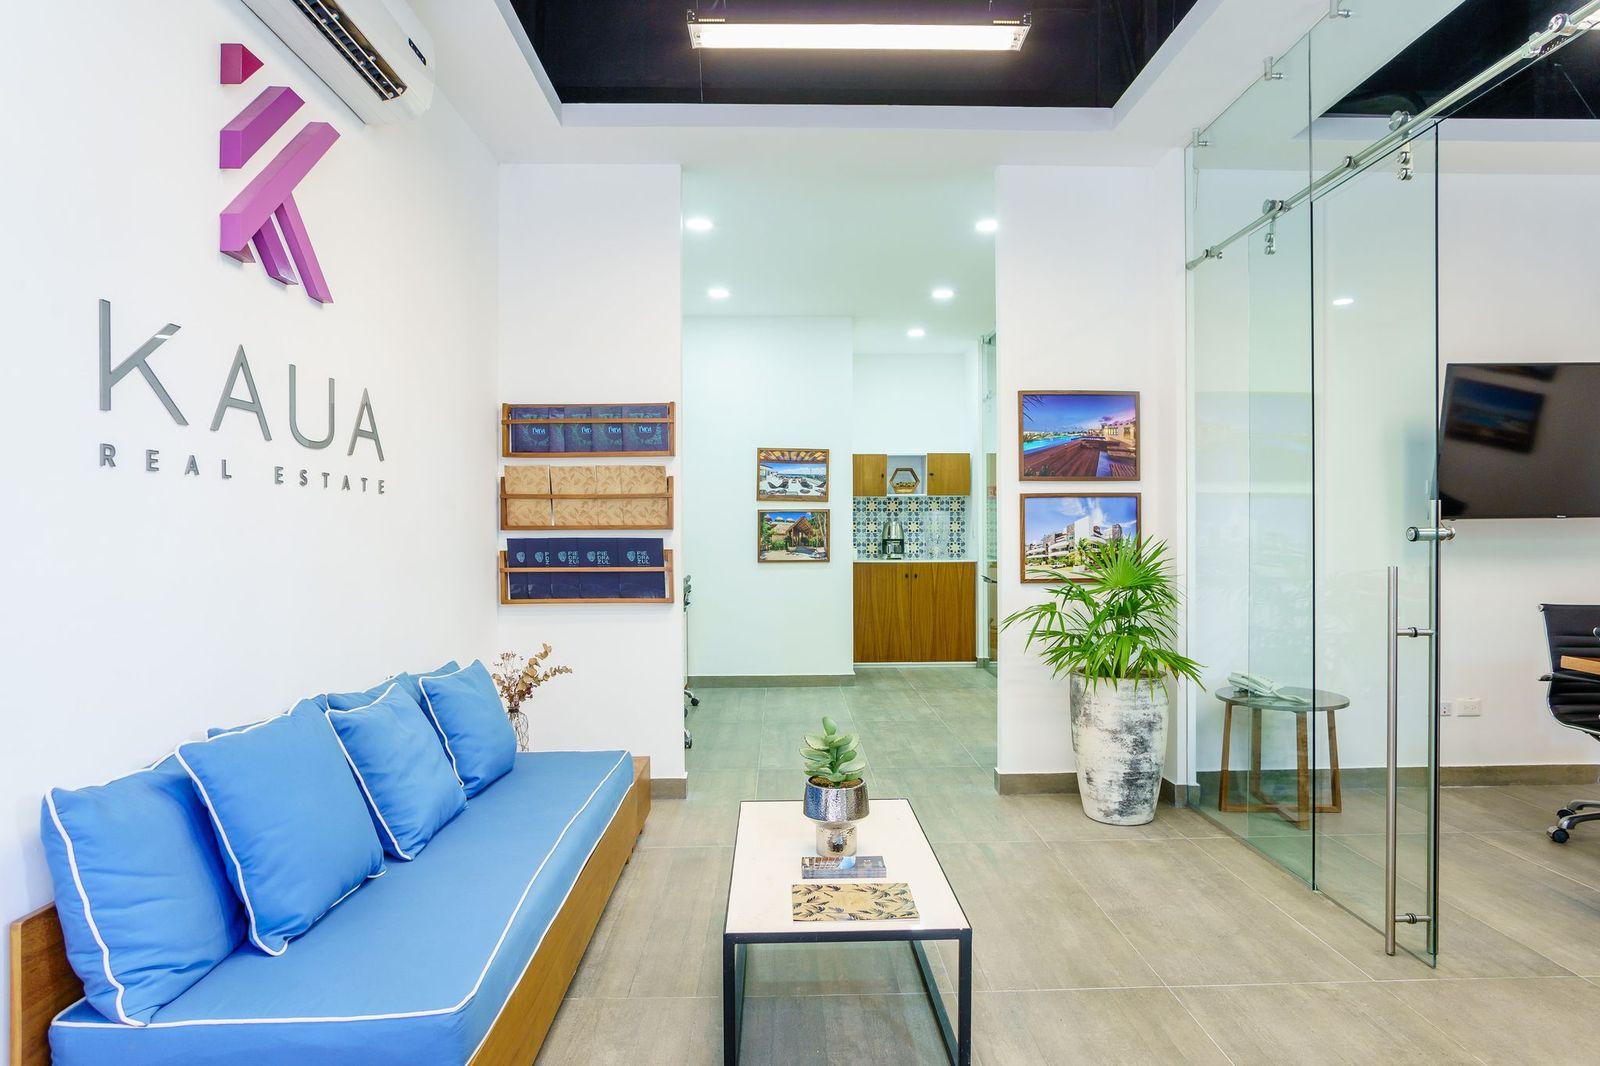 Kaua-Real-Estate-Oficina-Playa-del-Carmen-1